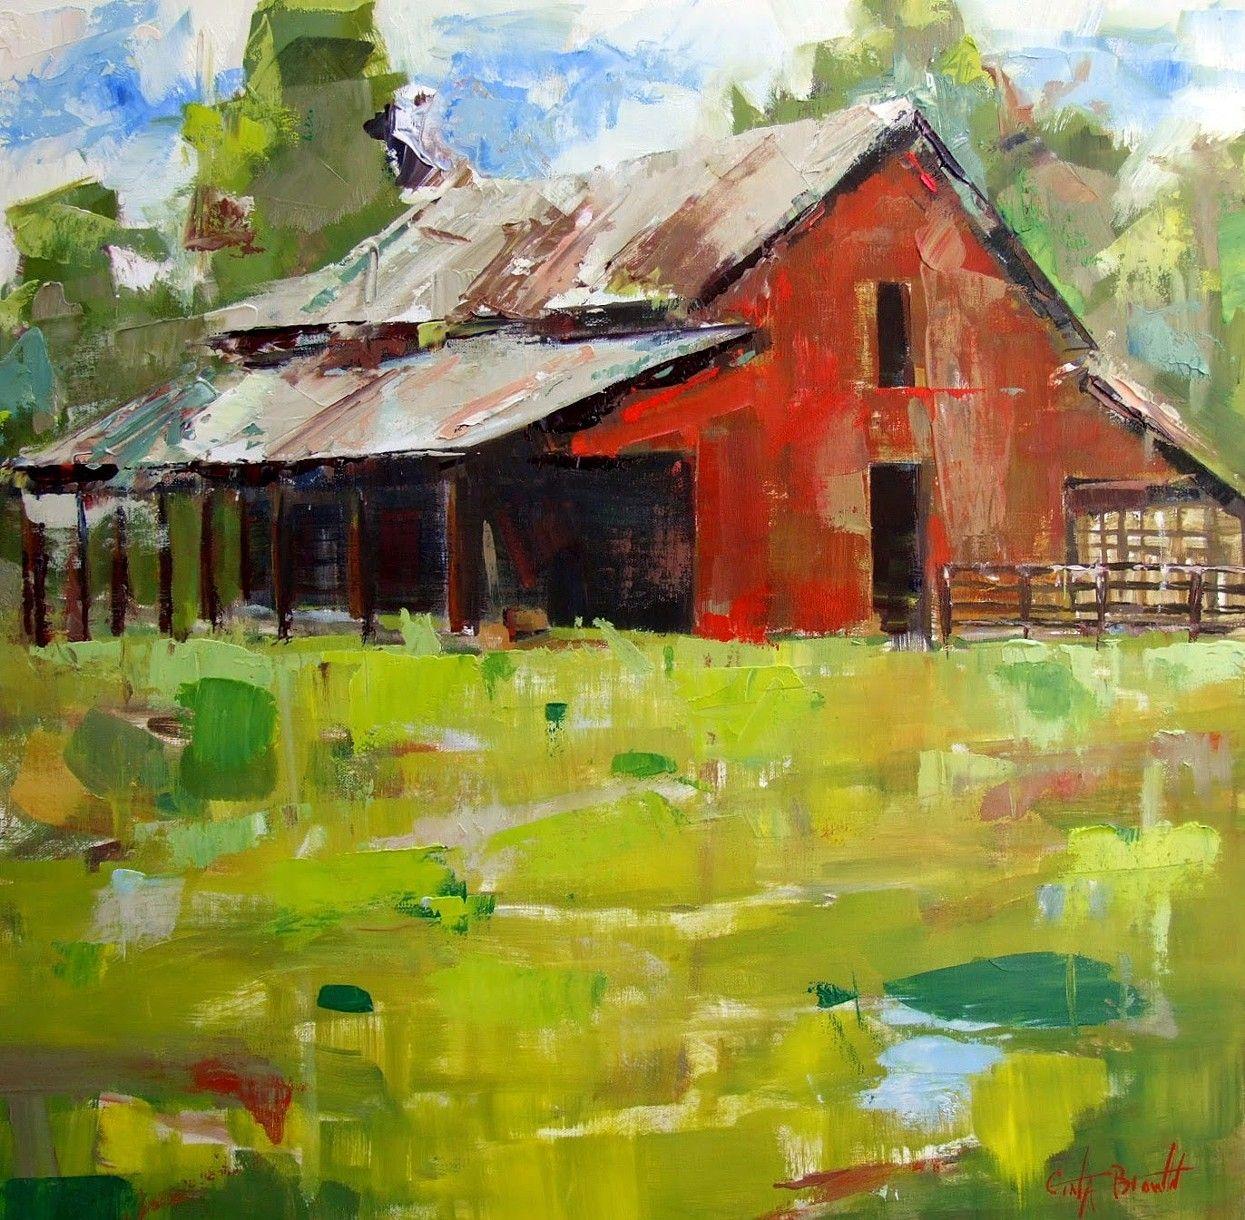 Original watercolor art for sale -  Big Red Barn Original Oil Painting By Alabama Artist Gina Brown